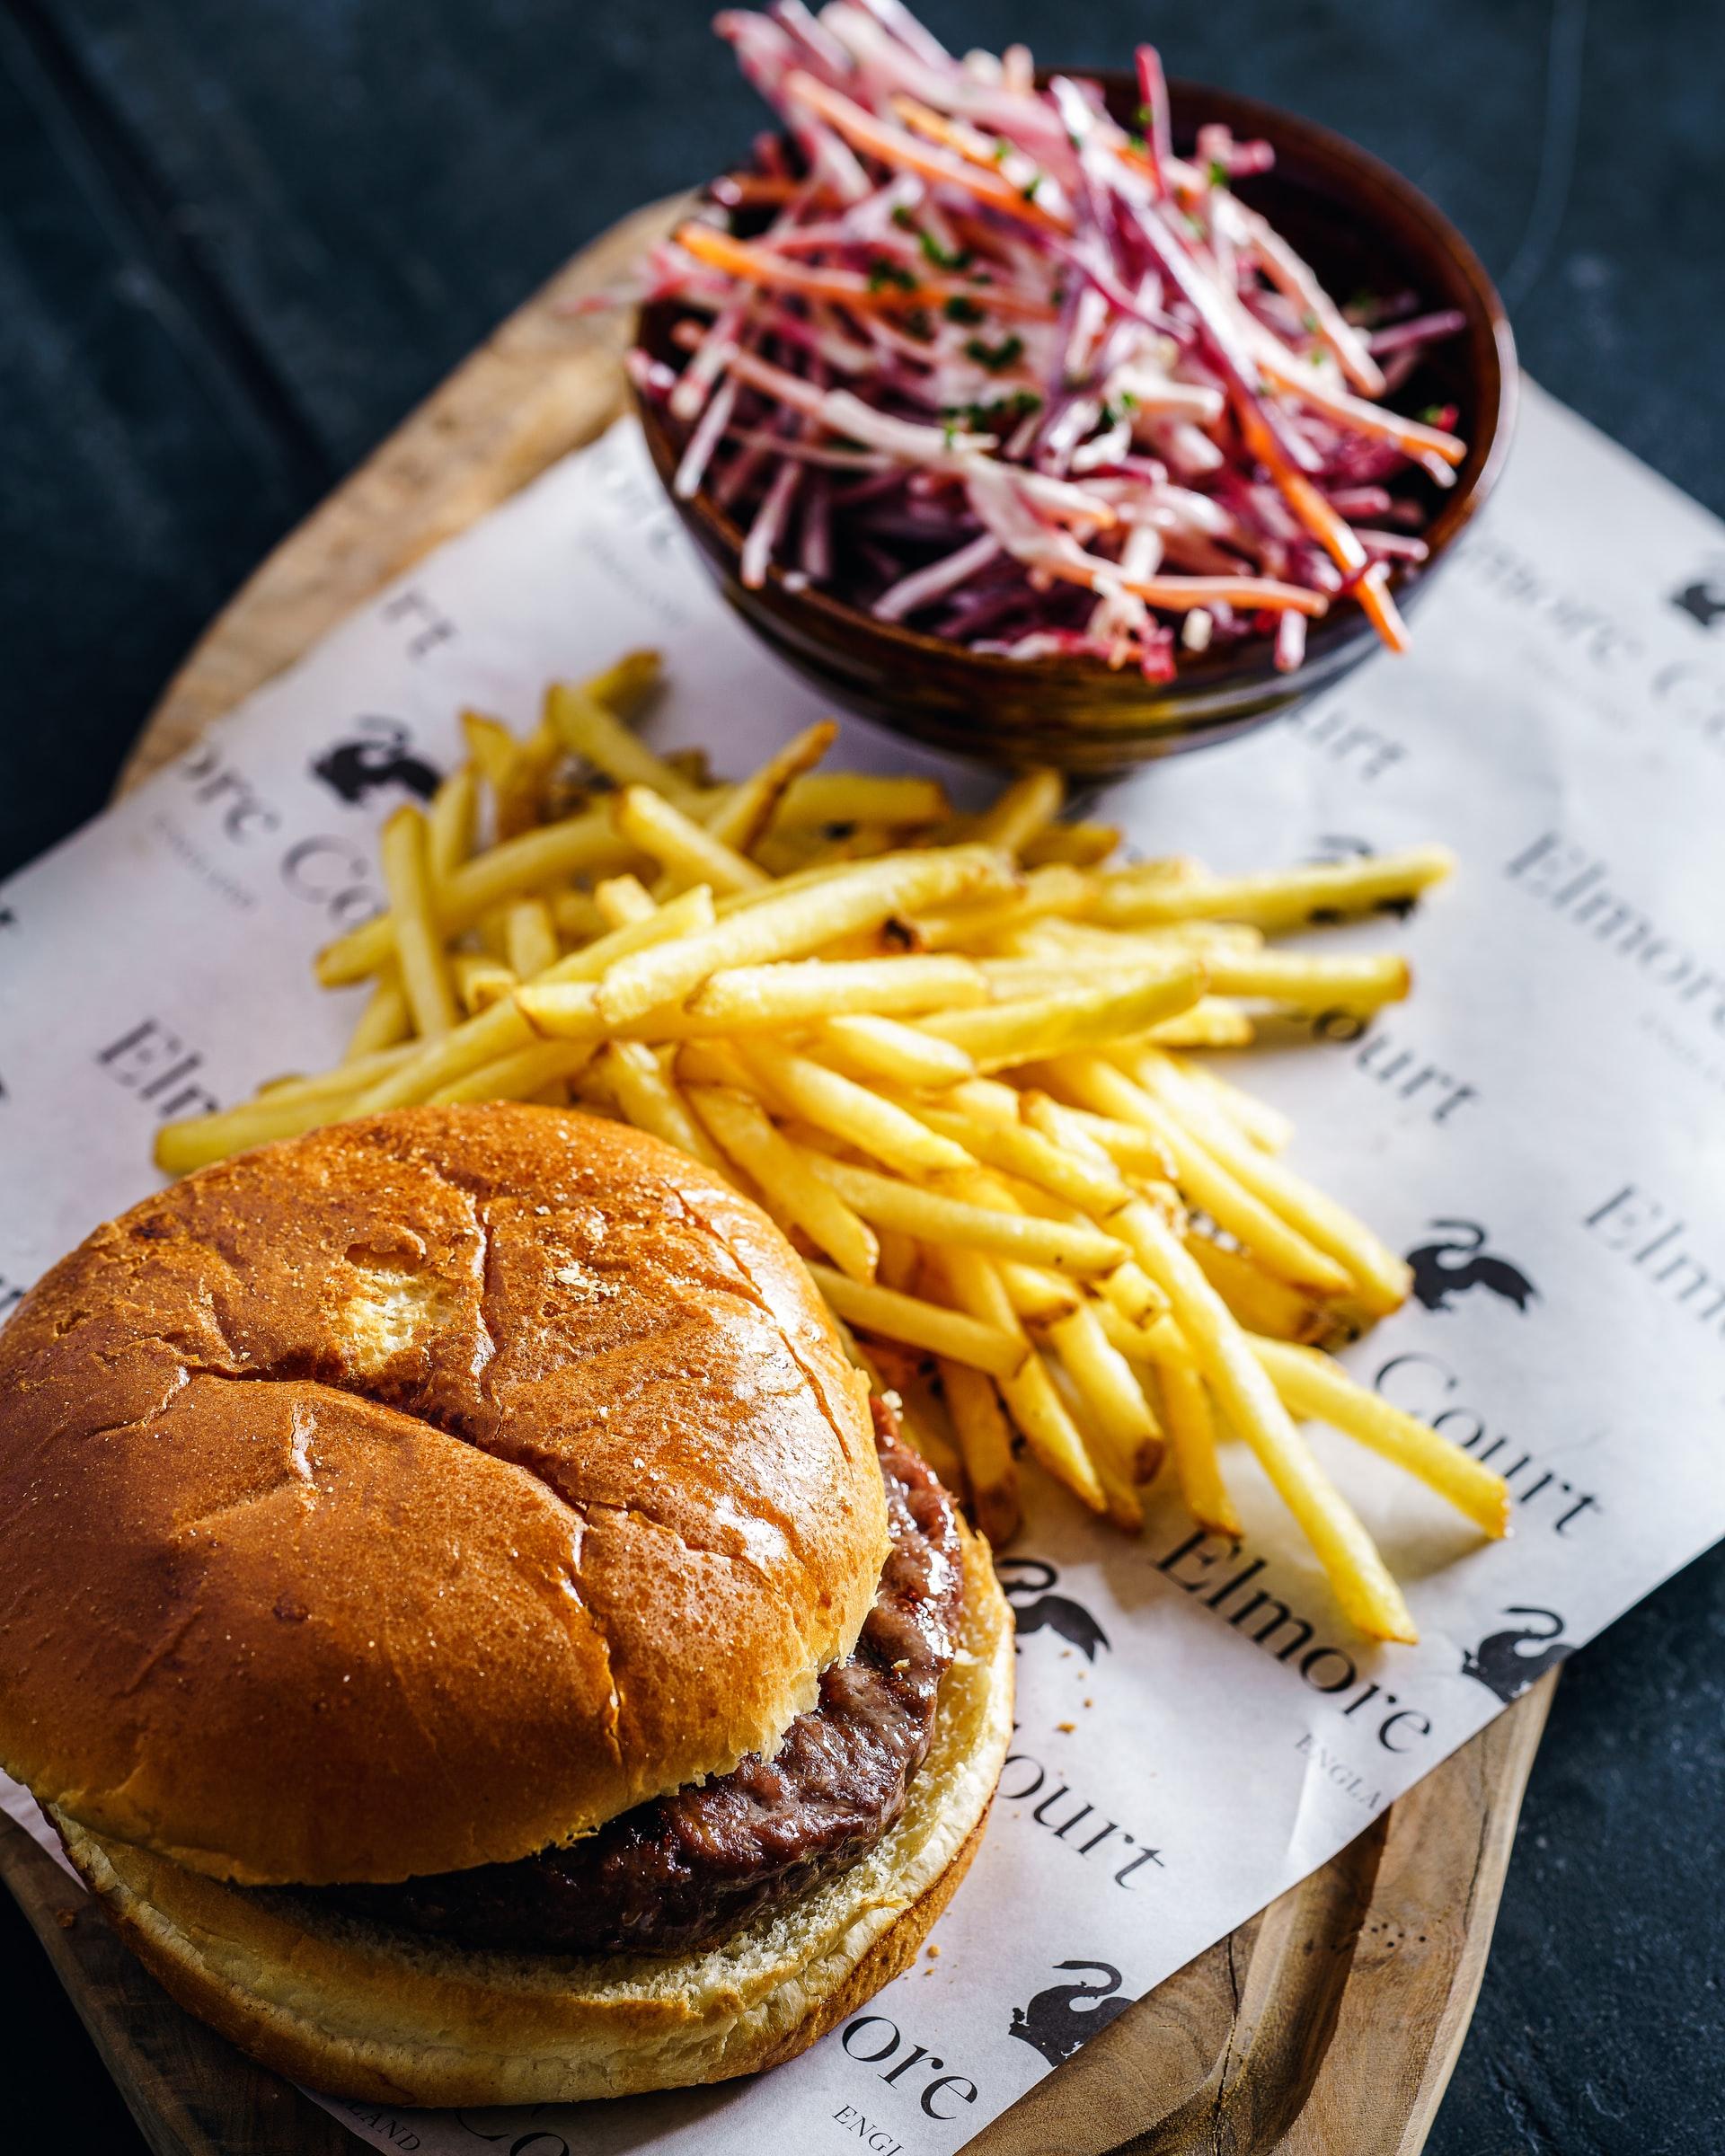 Burger & slaw